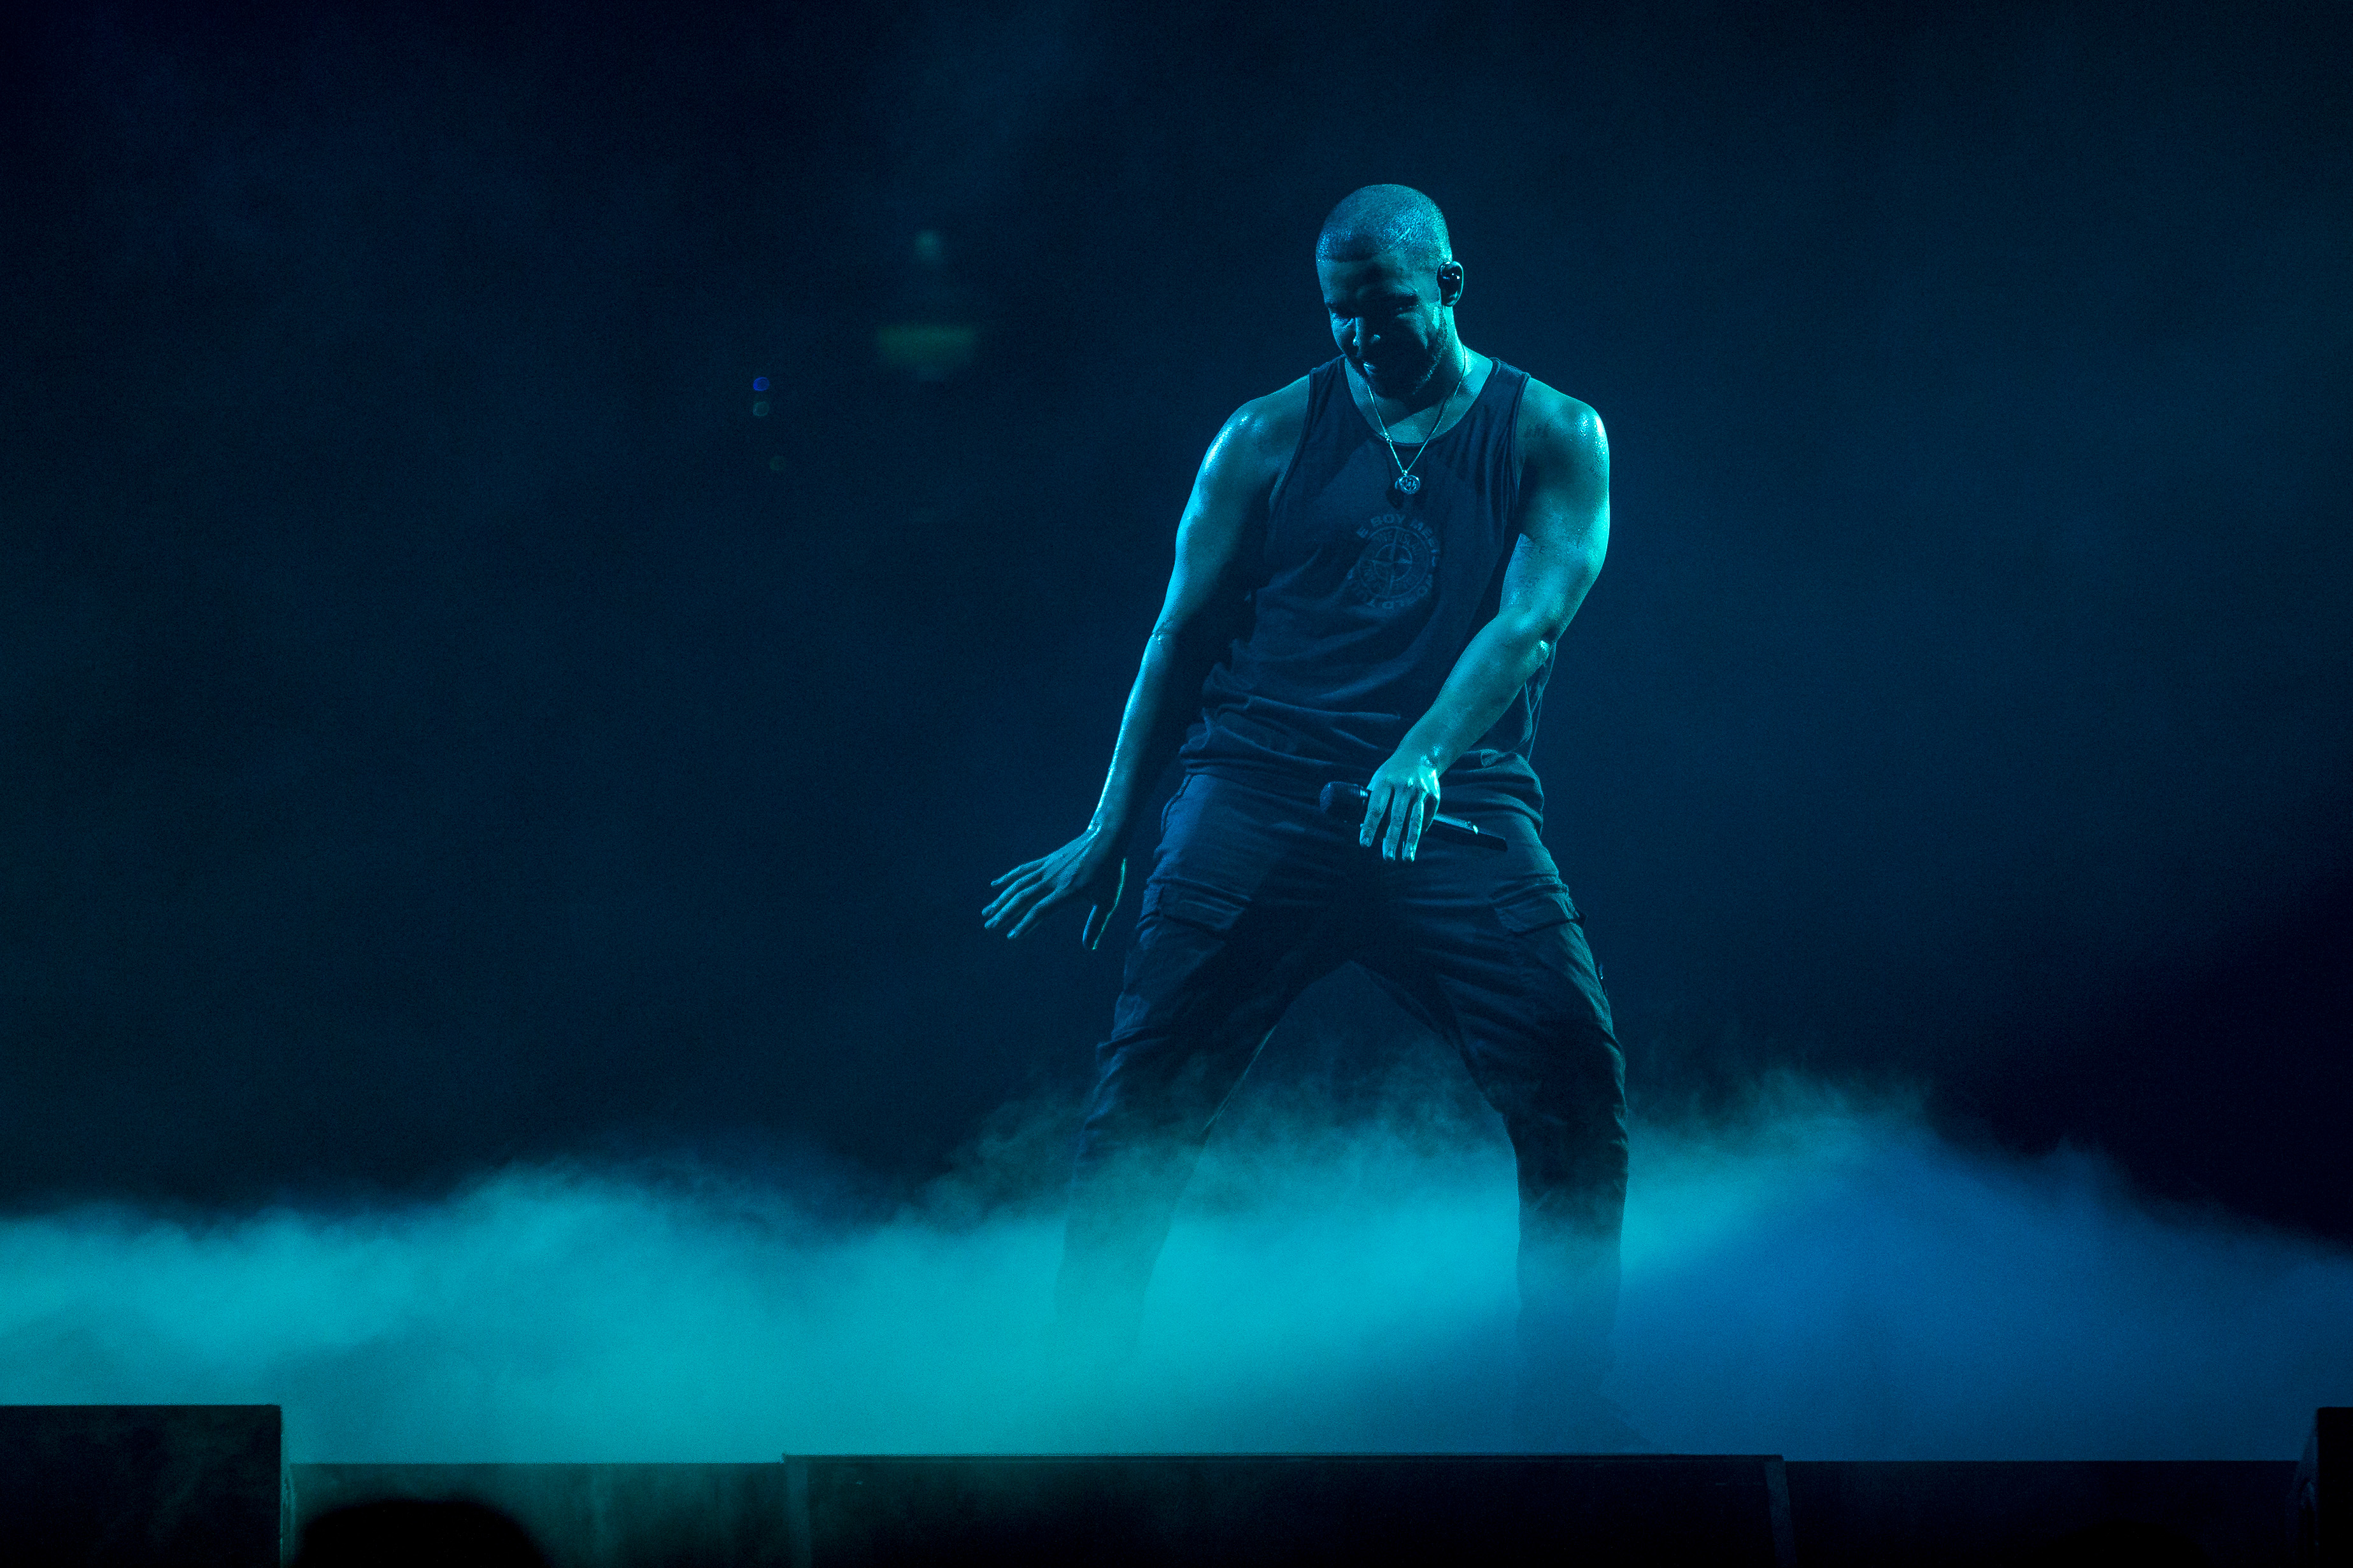 Drake Performs in Concert in Stockholm